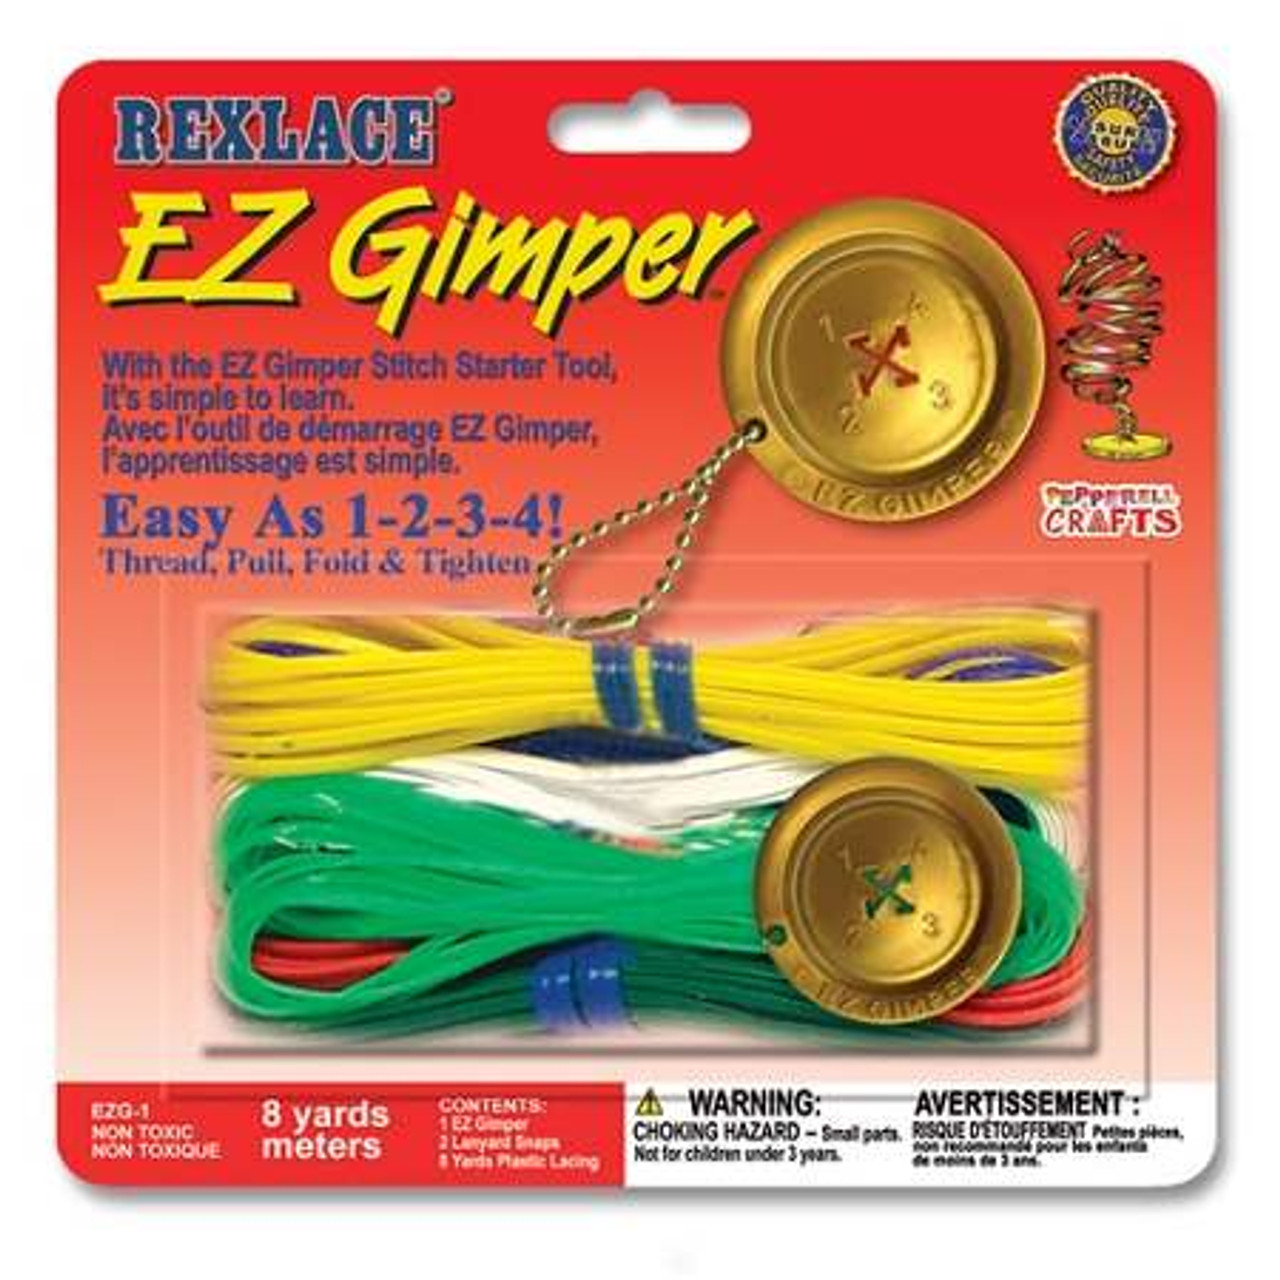 Pepperell Rexlace Cord 450 FT 2 Rings 6 lanyard Snaps EZ Gimper Beading line Kit